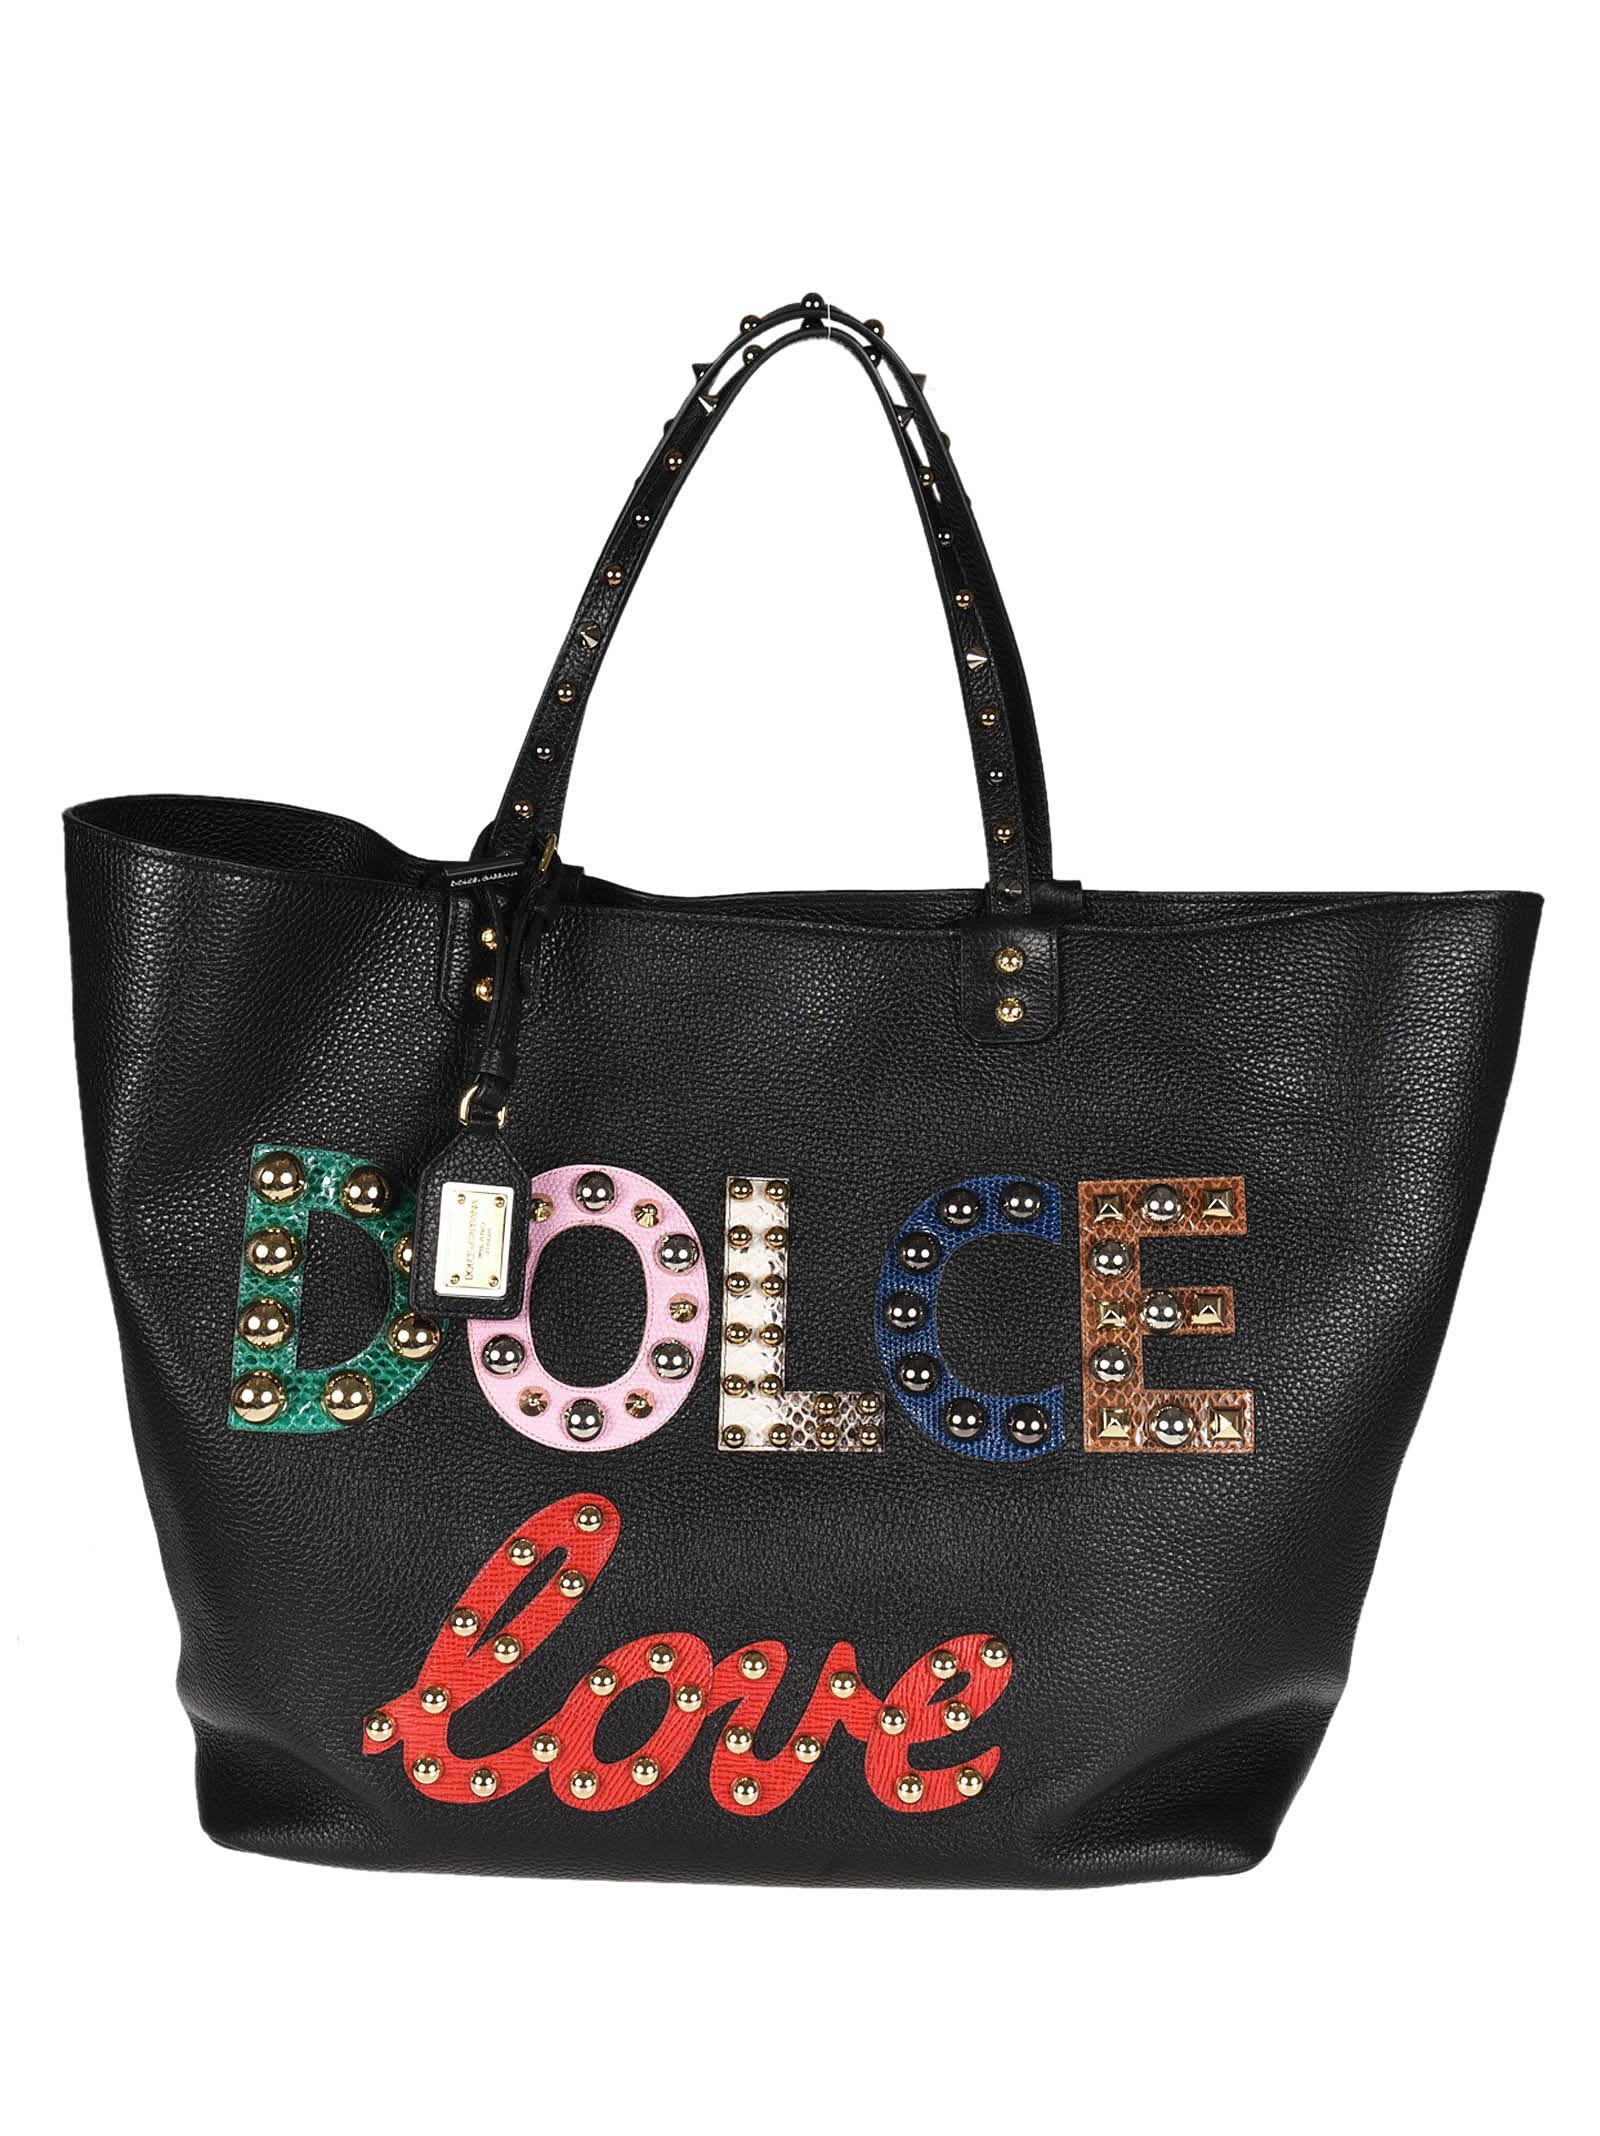 Dolce & Gabbana Beatrice Tote